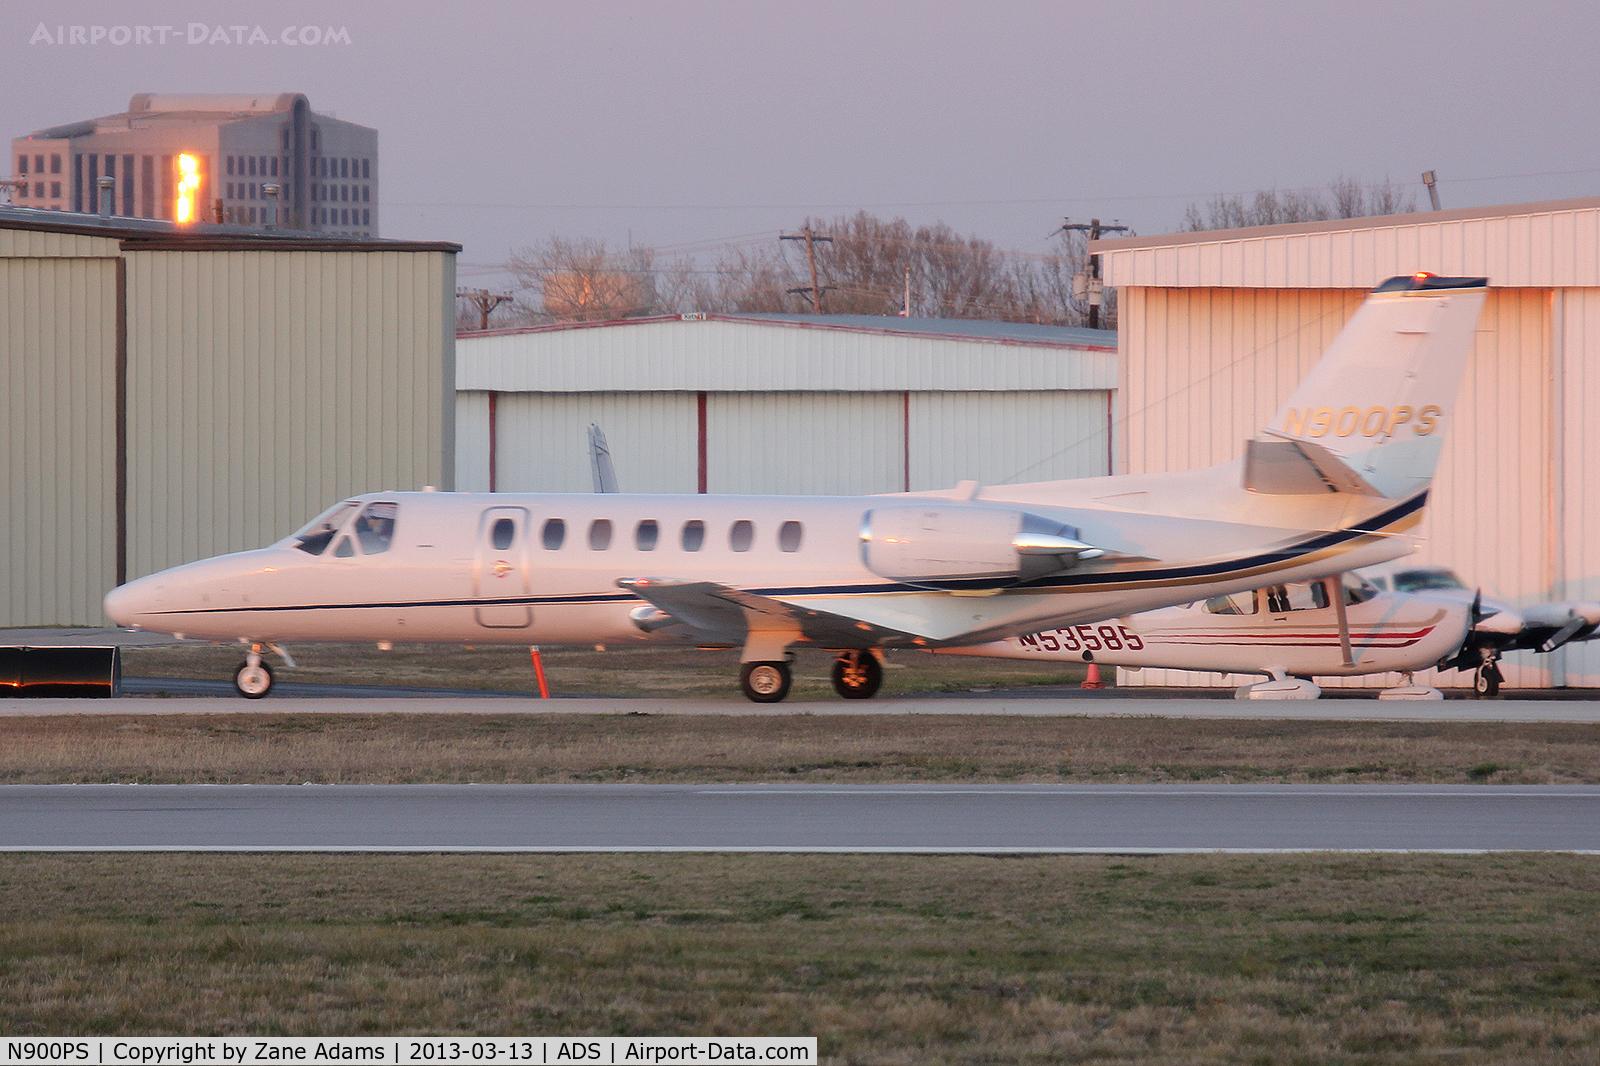 N900PS, 1991 Cessna 560 Citation V C/N 560-0118, At Addison Airport